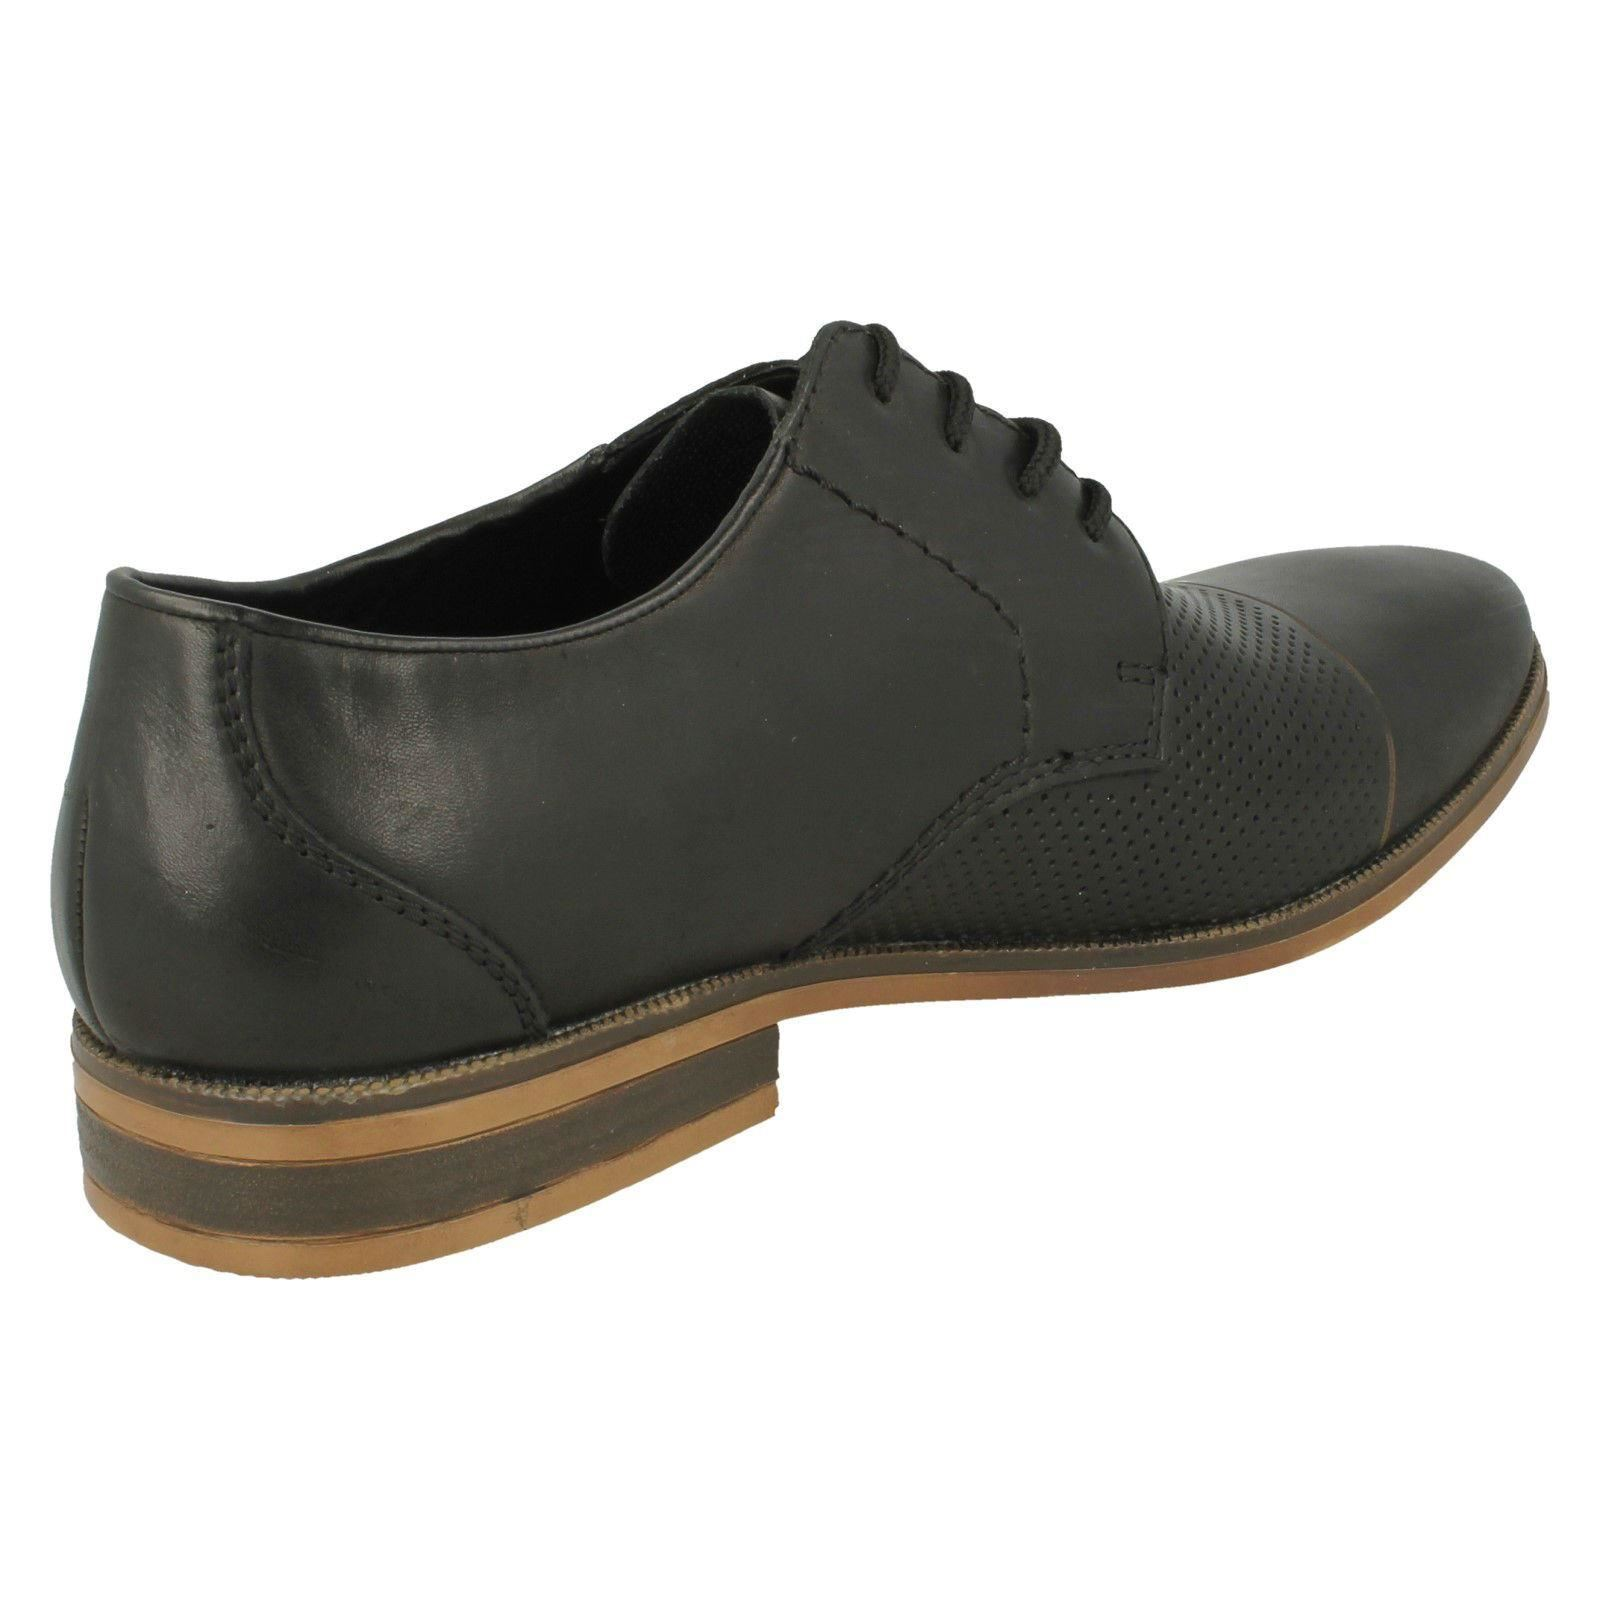 Mens Rieker 11615 Black Leather Smart Casual Lace Up Shoes Shoes Up 613e46